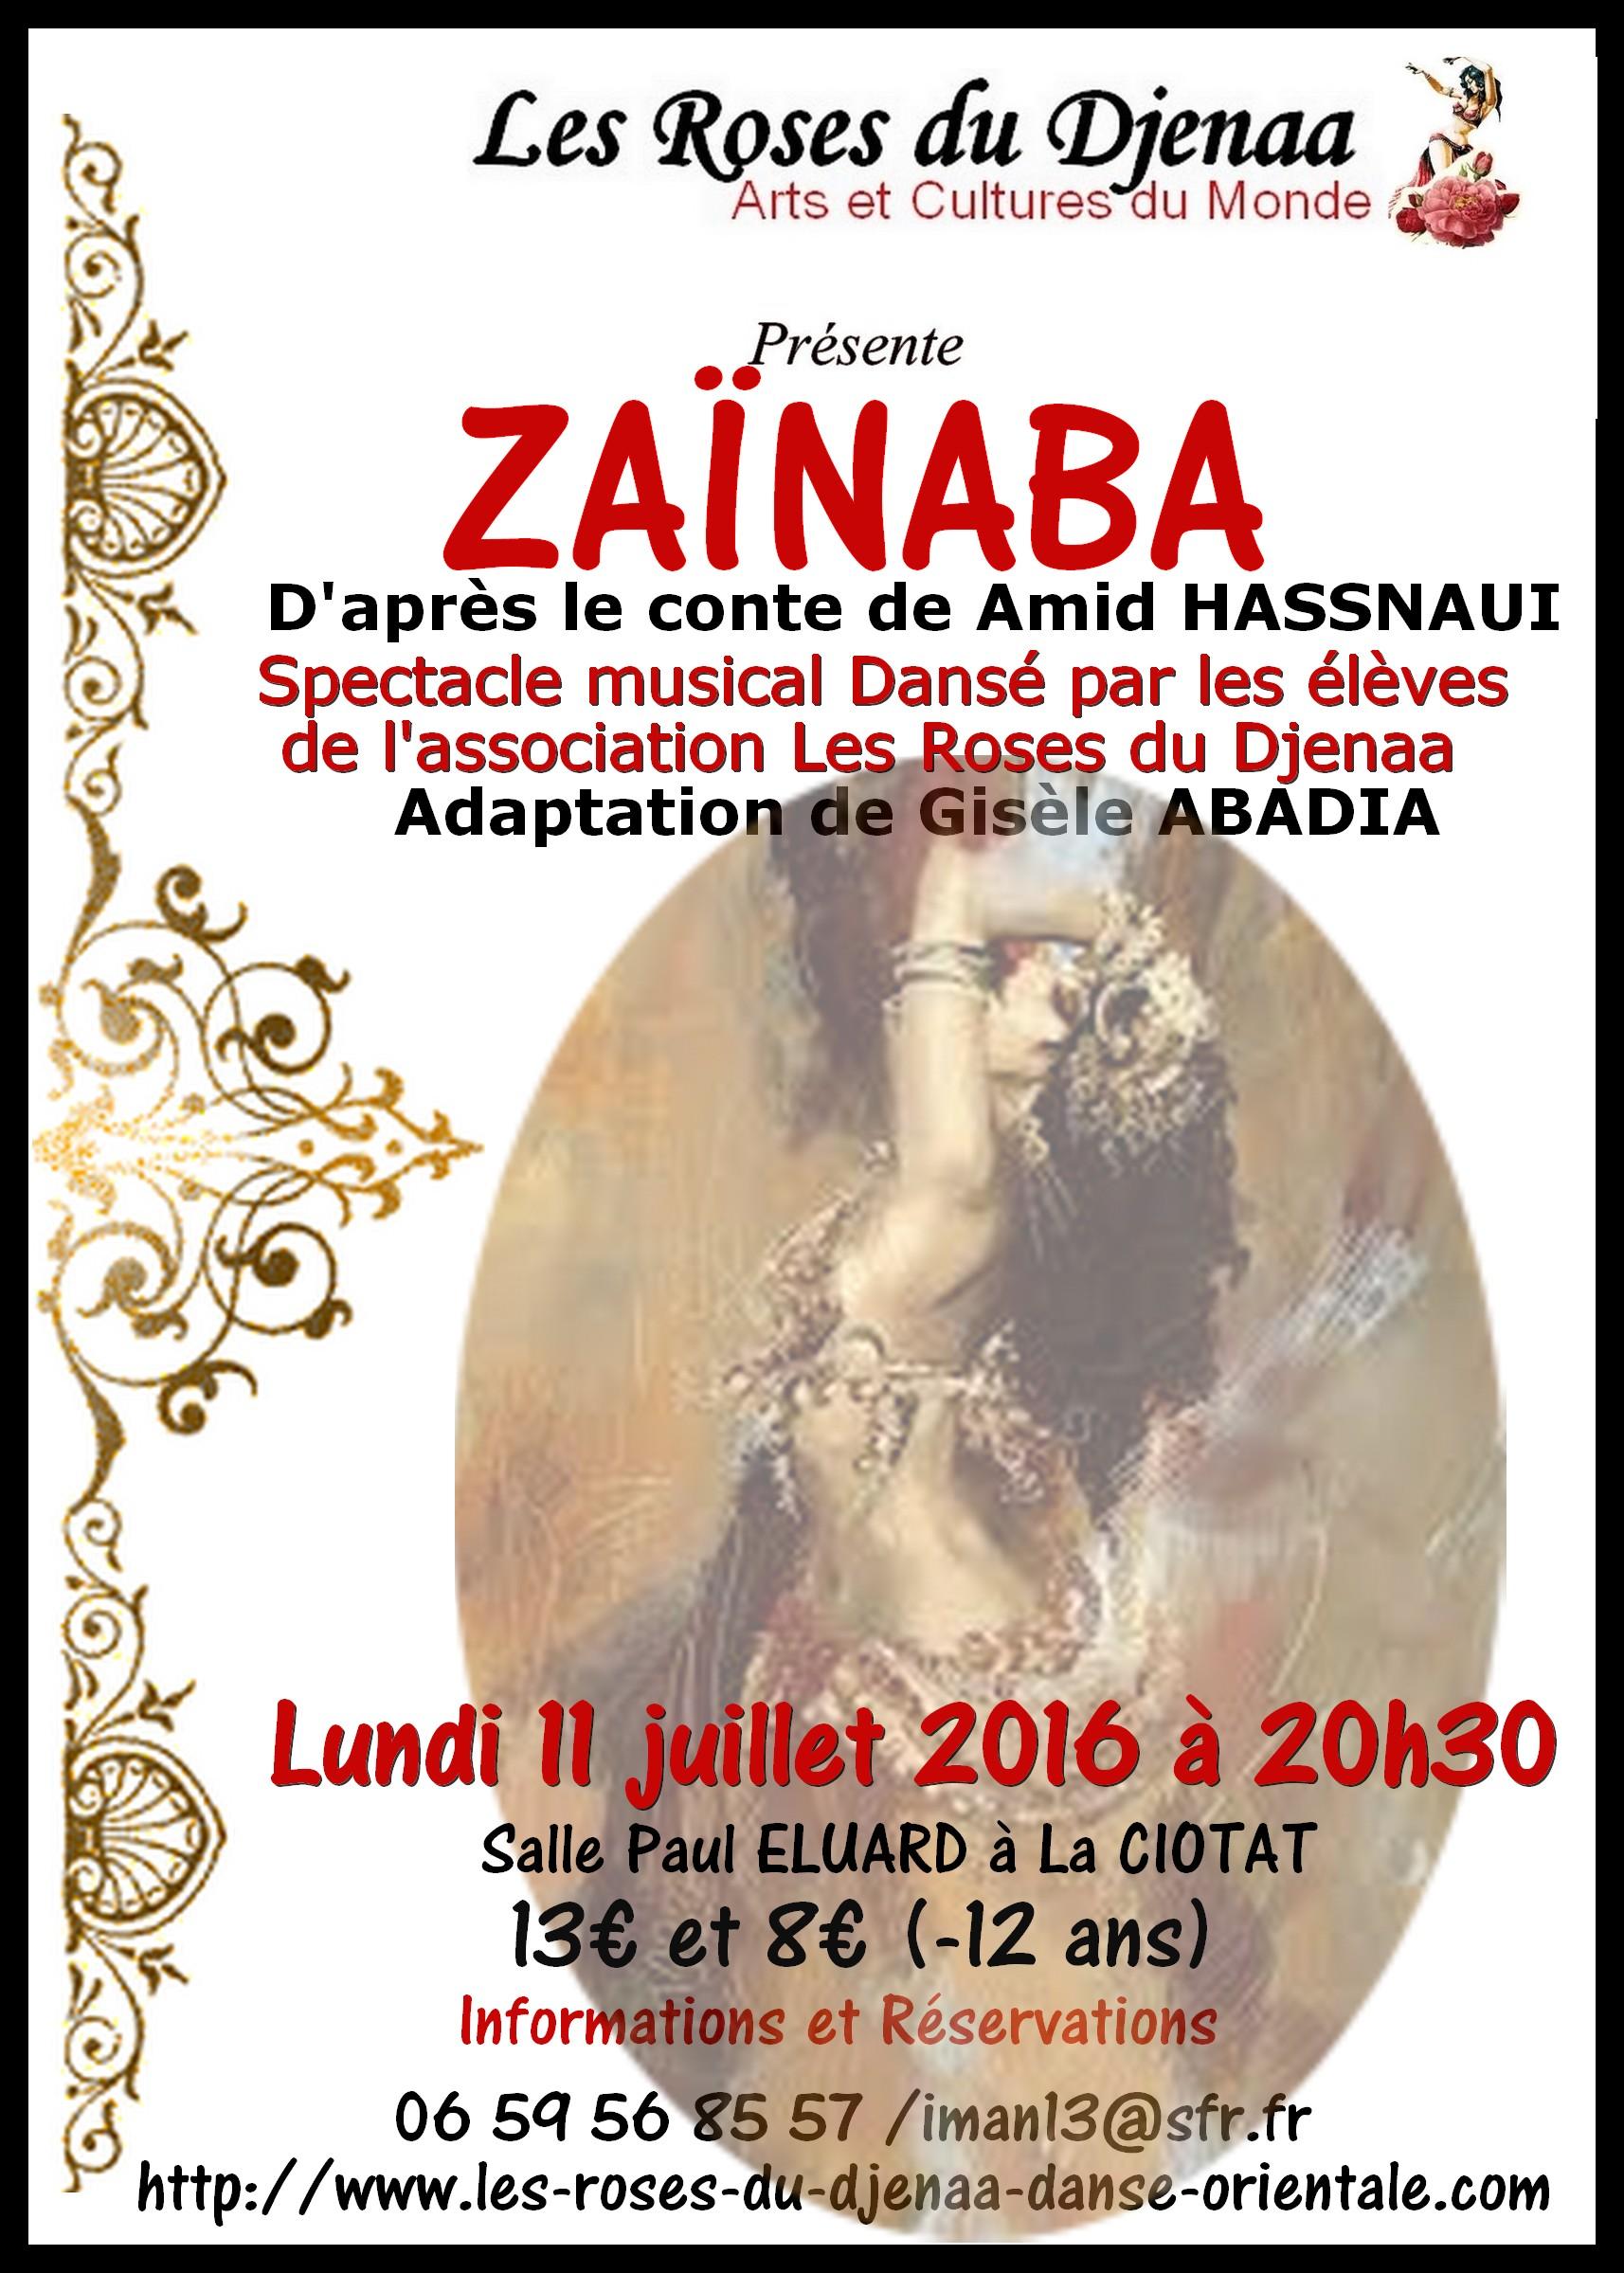 Zainaba_conte_danse_spectacle.jpg